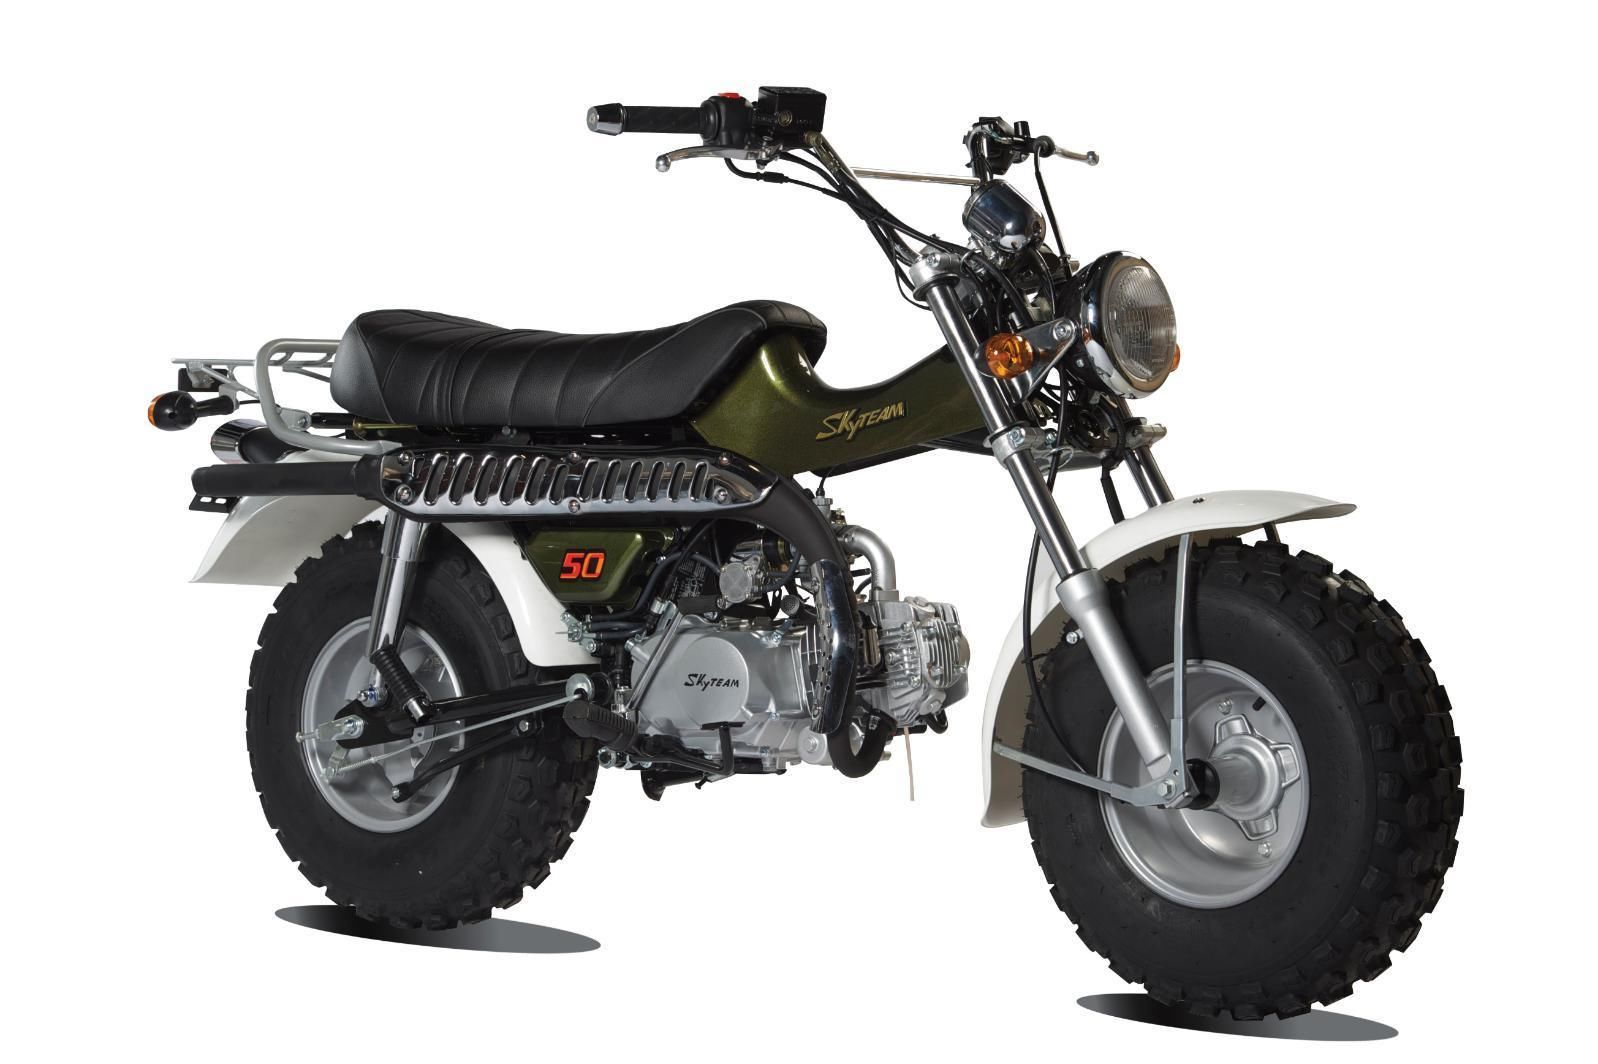 Skyteam T Rex 50 Moped New 50cc Based On Suzuki Rv125 Sand